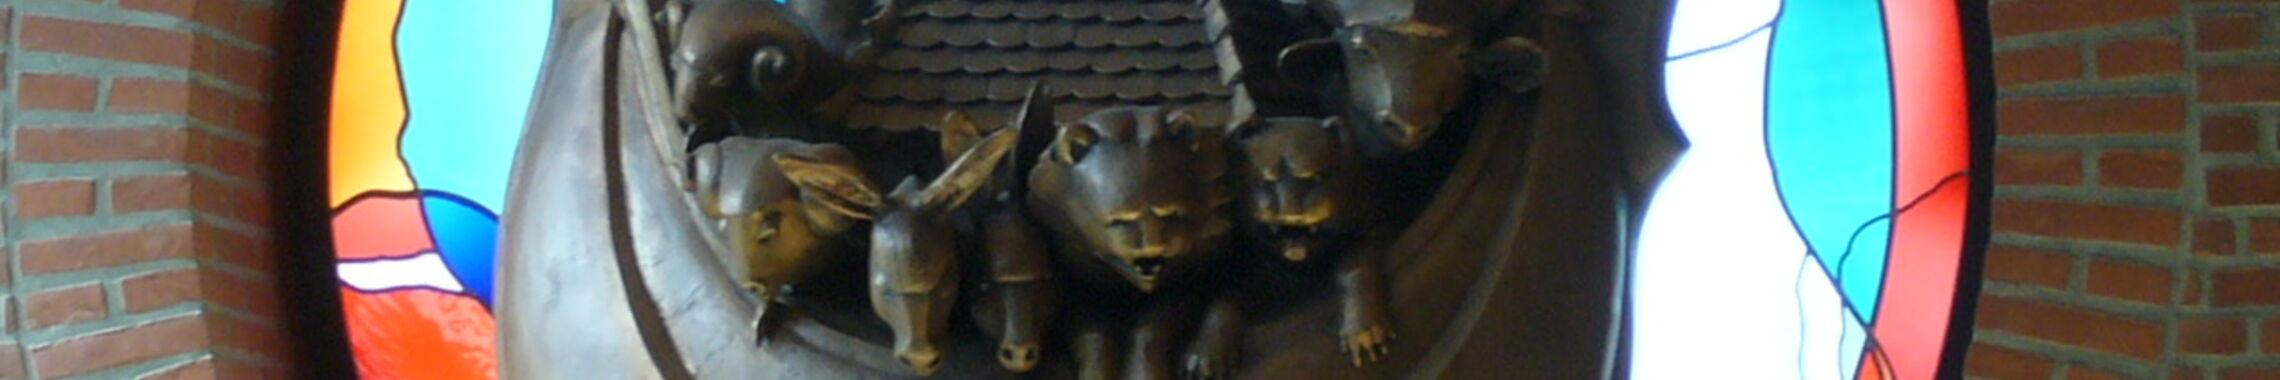 Bronzearche